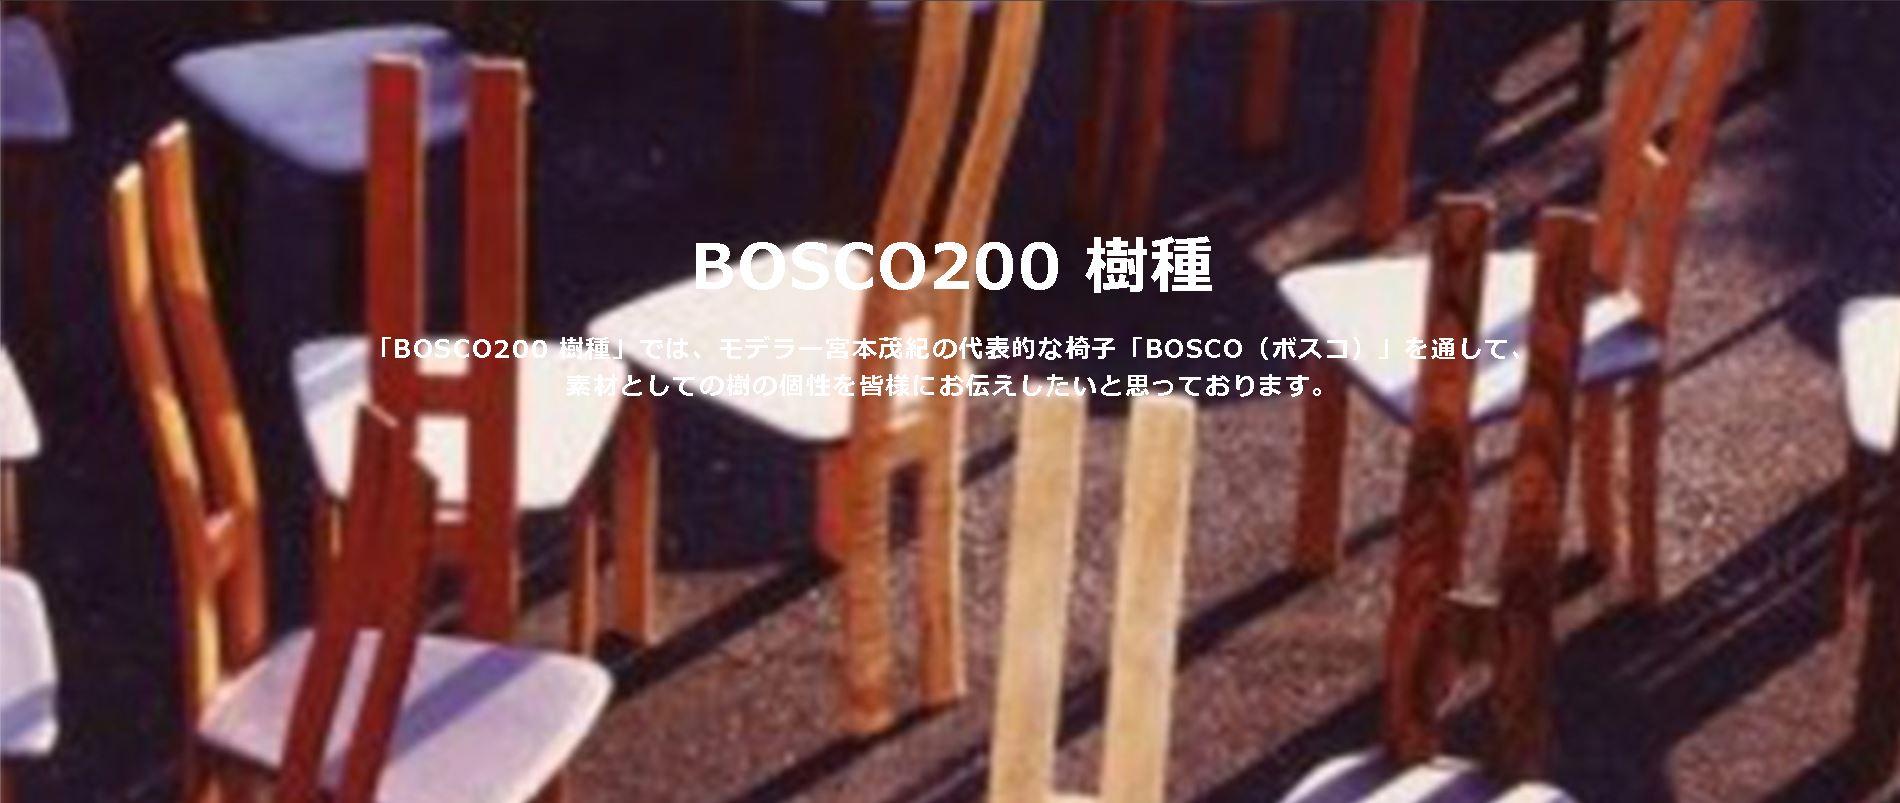 "alt=""Bosco200 樹種"""